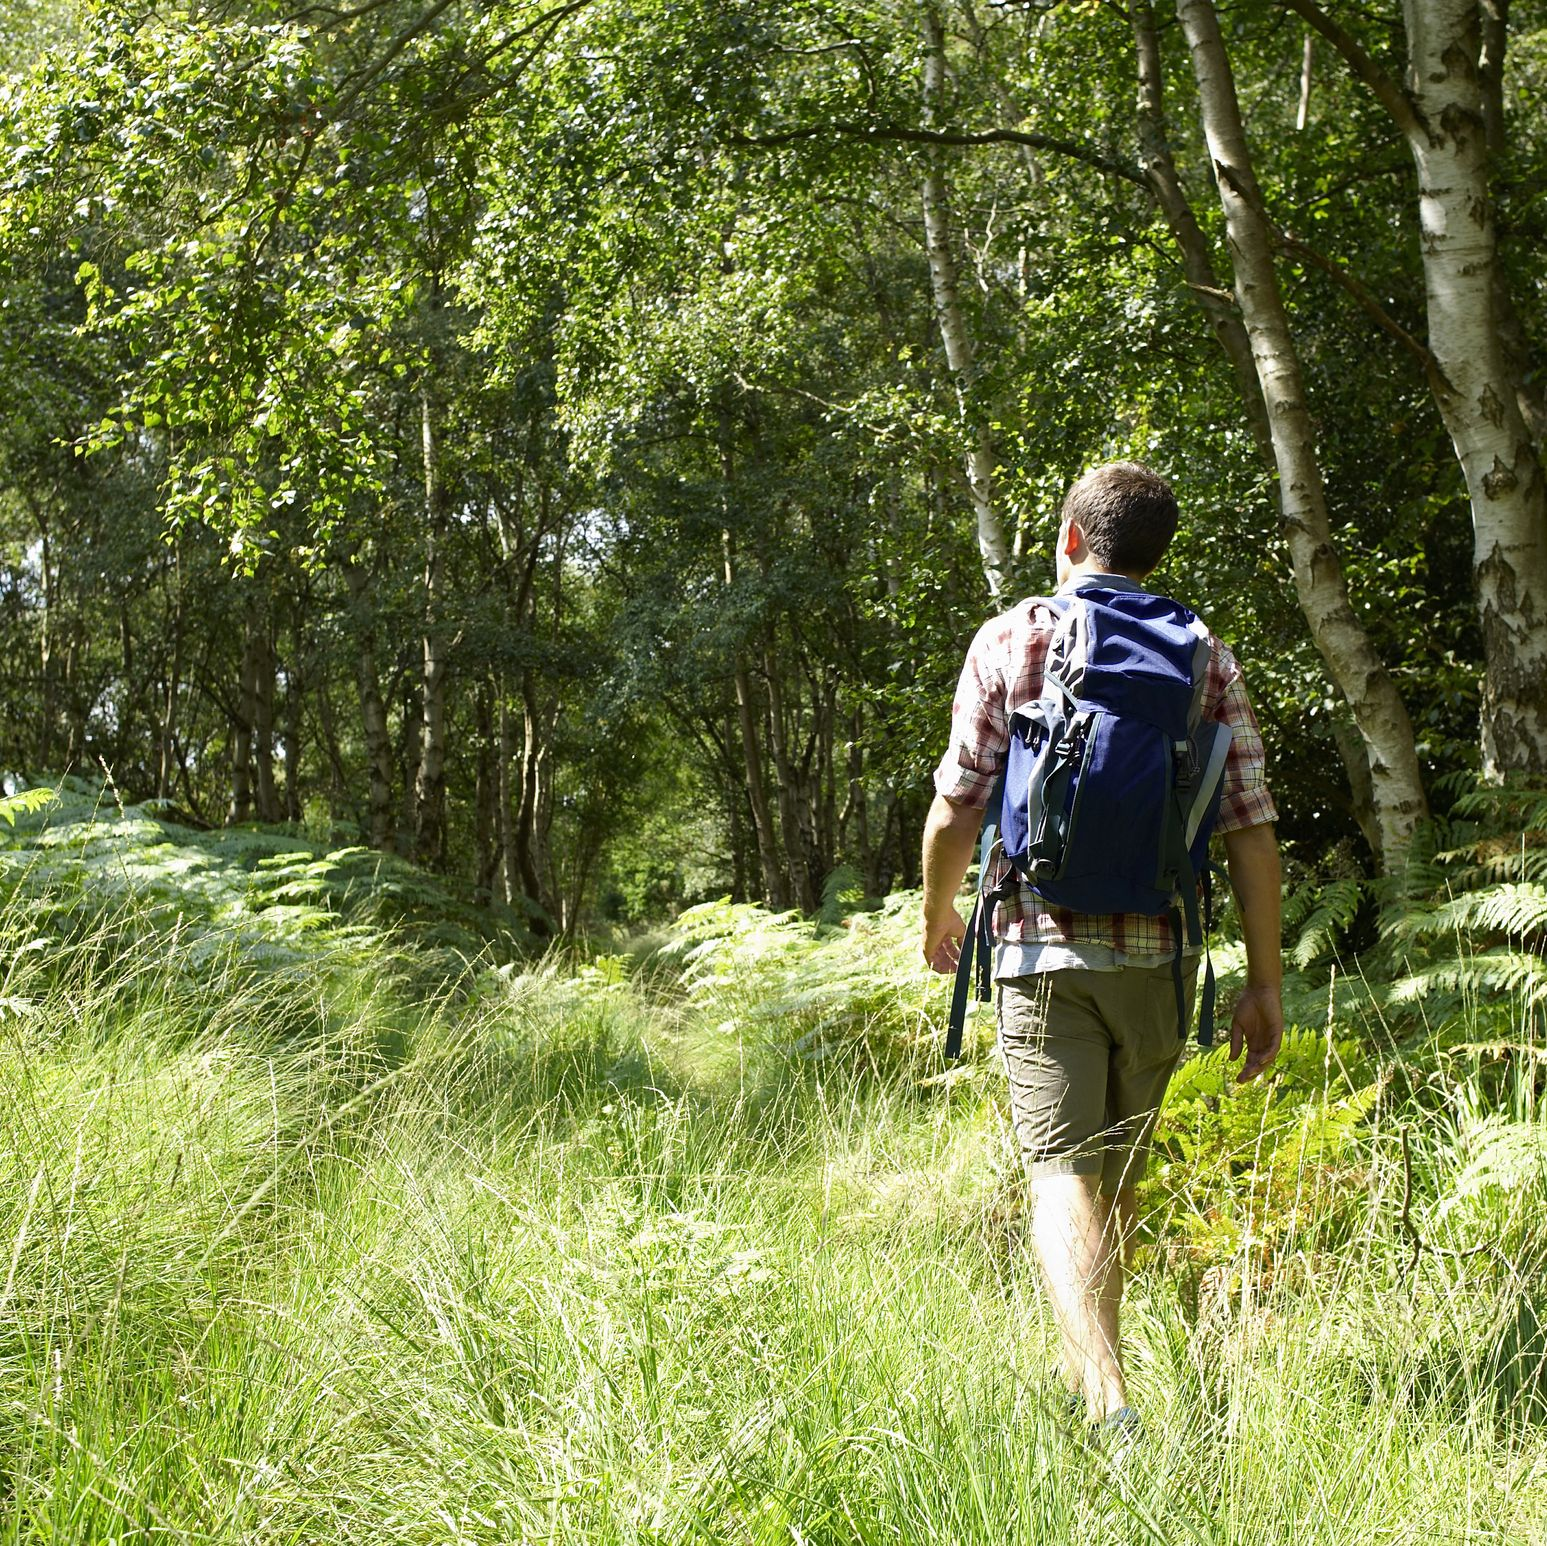 Young hiker walking through woodland.